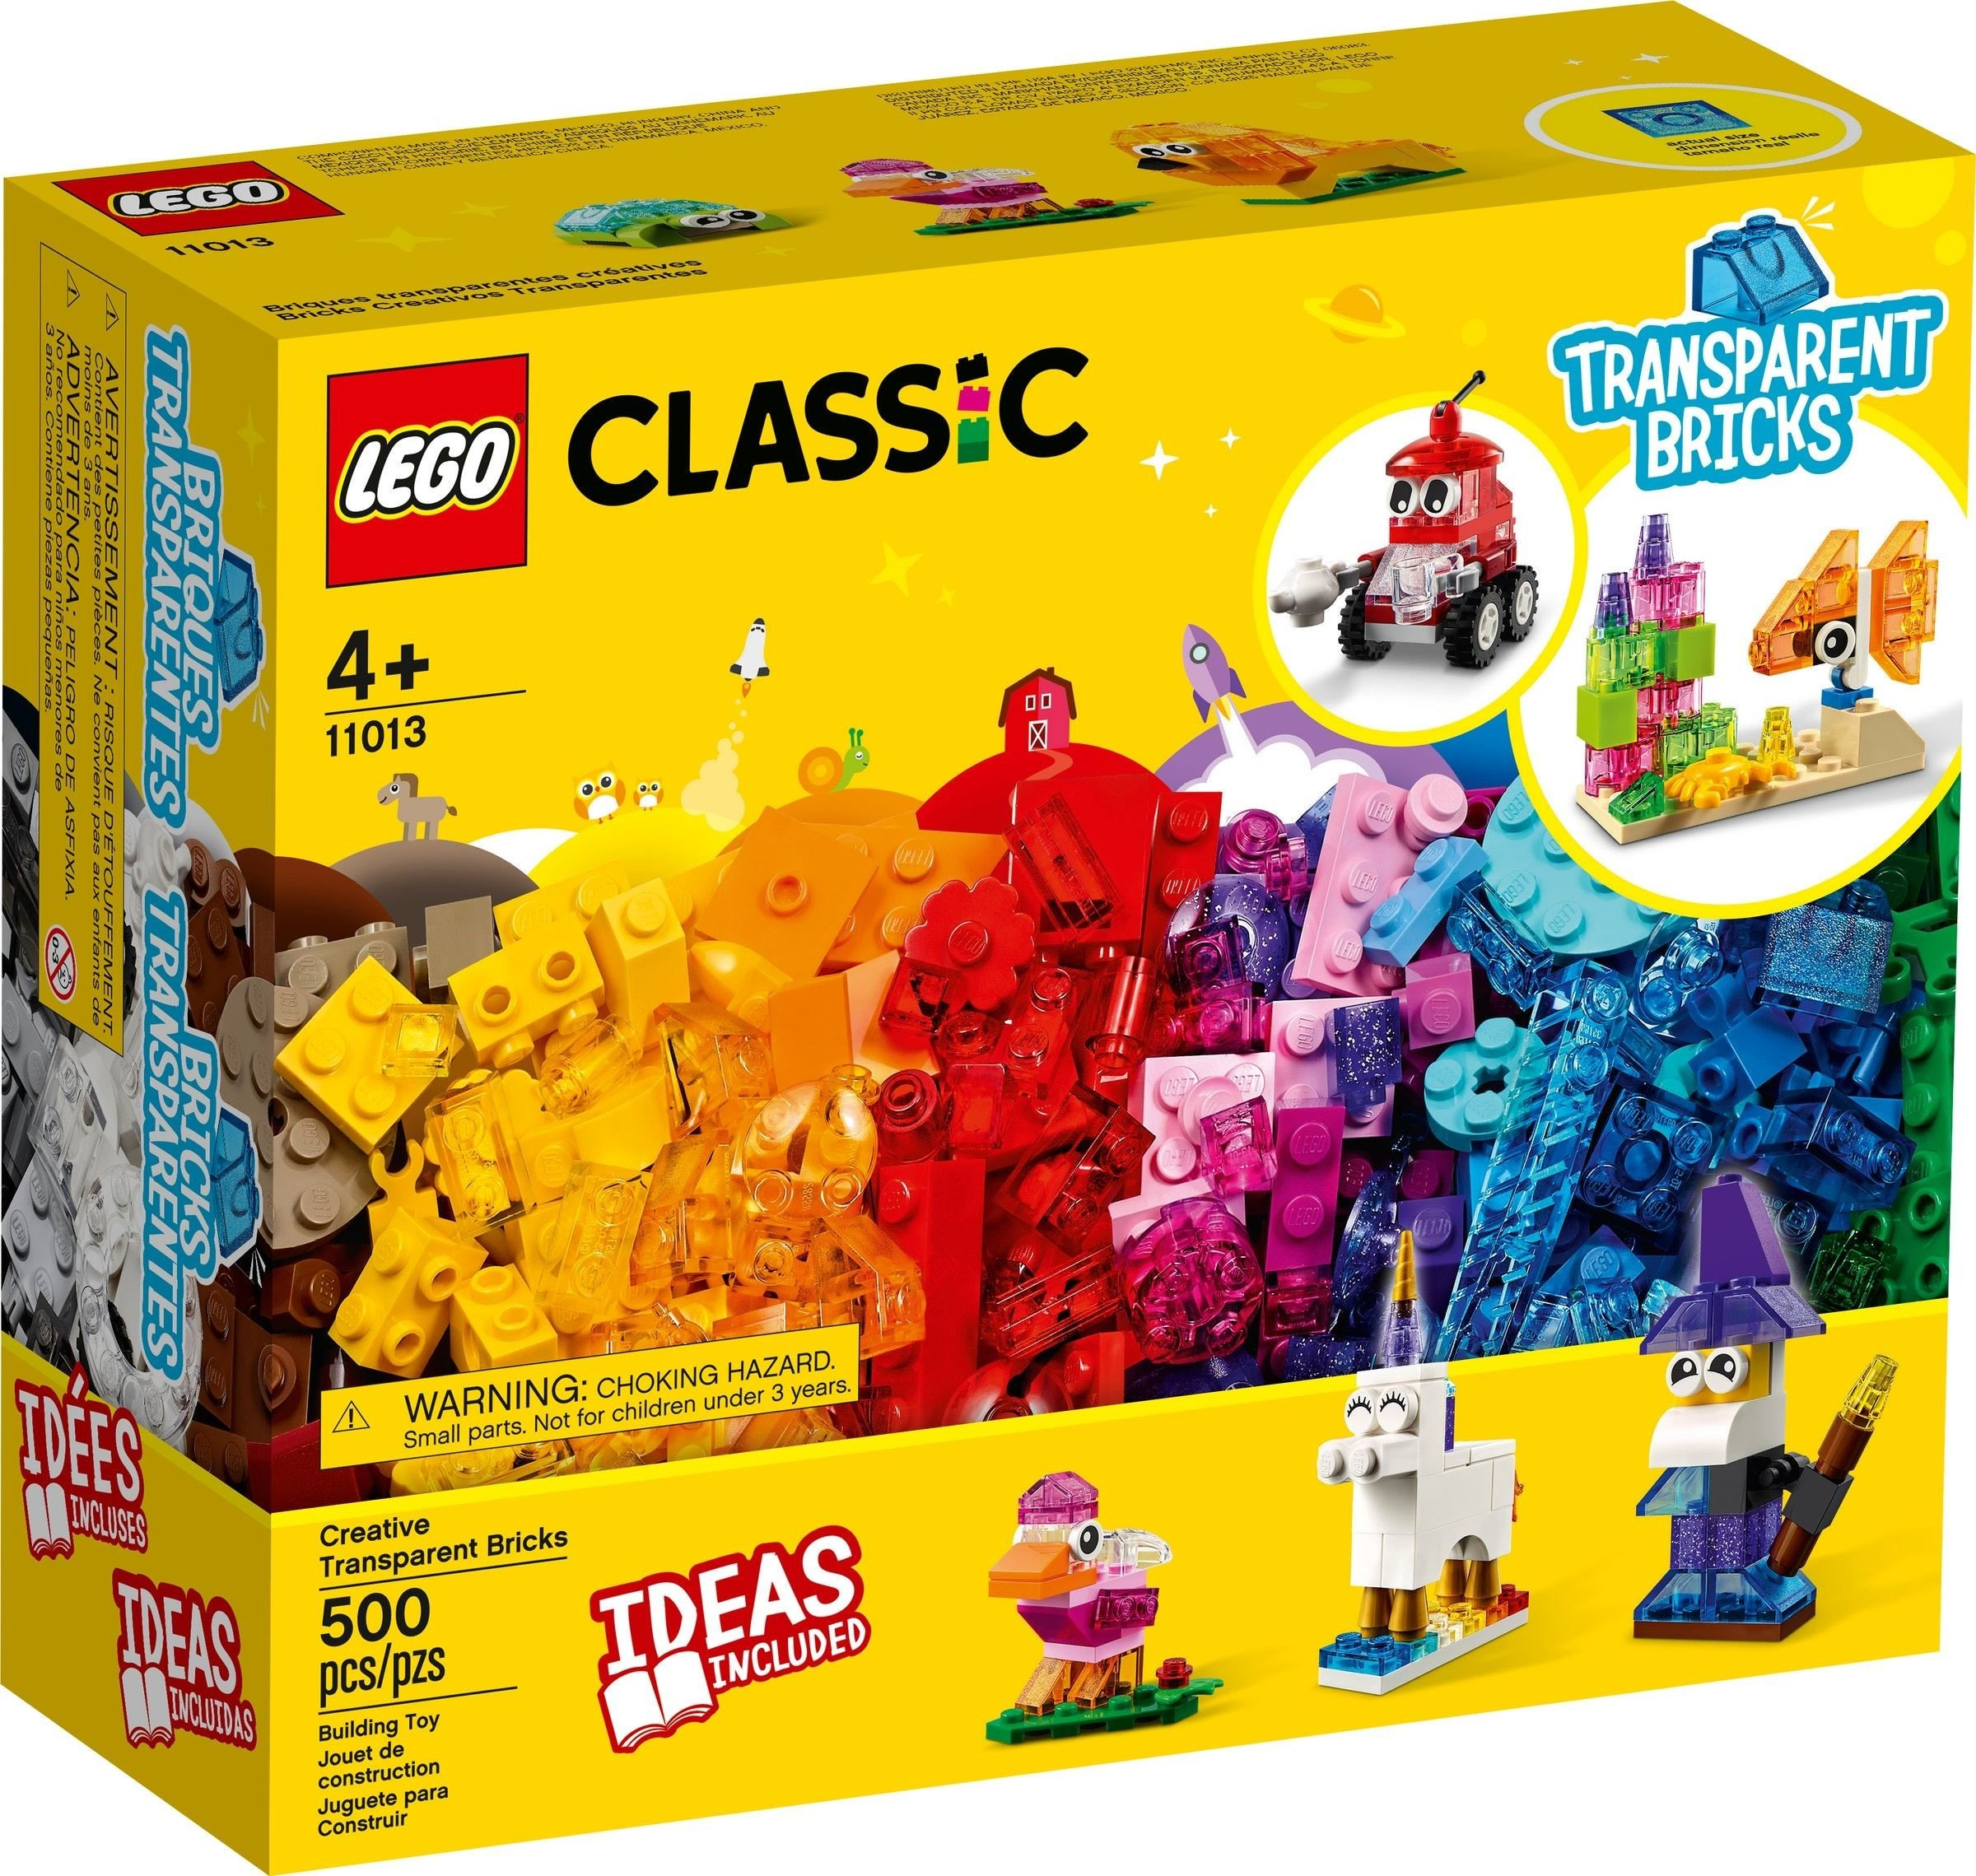 LEGO Classic - Creative Transparent Bricks (11013)